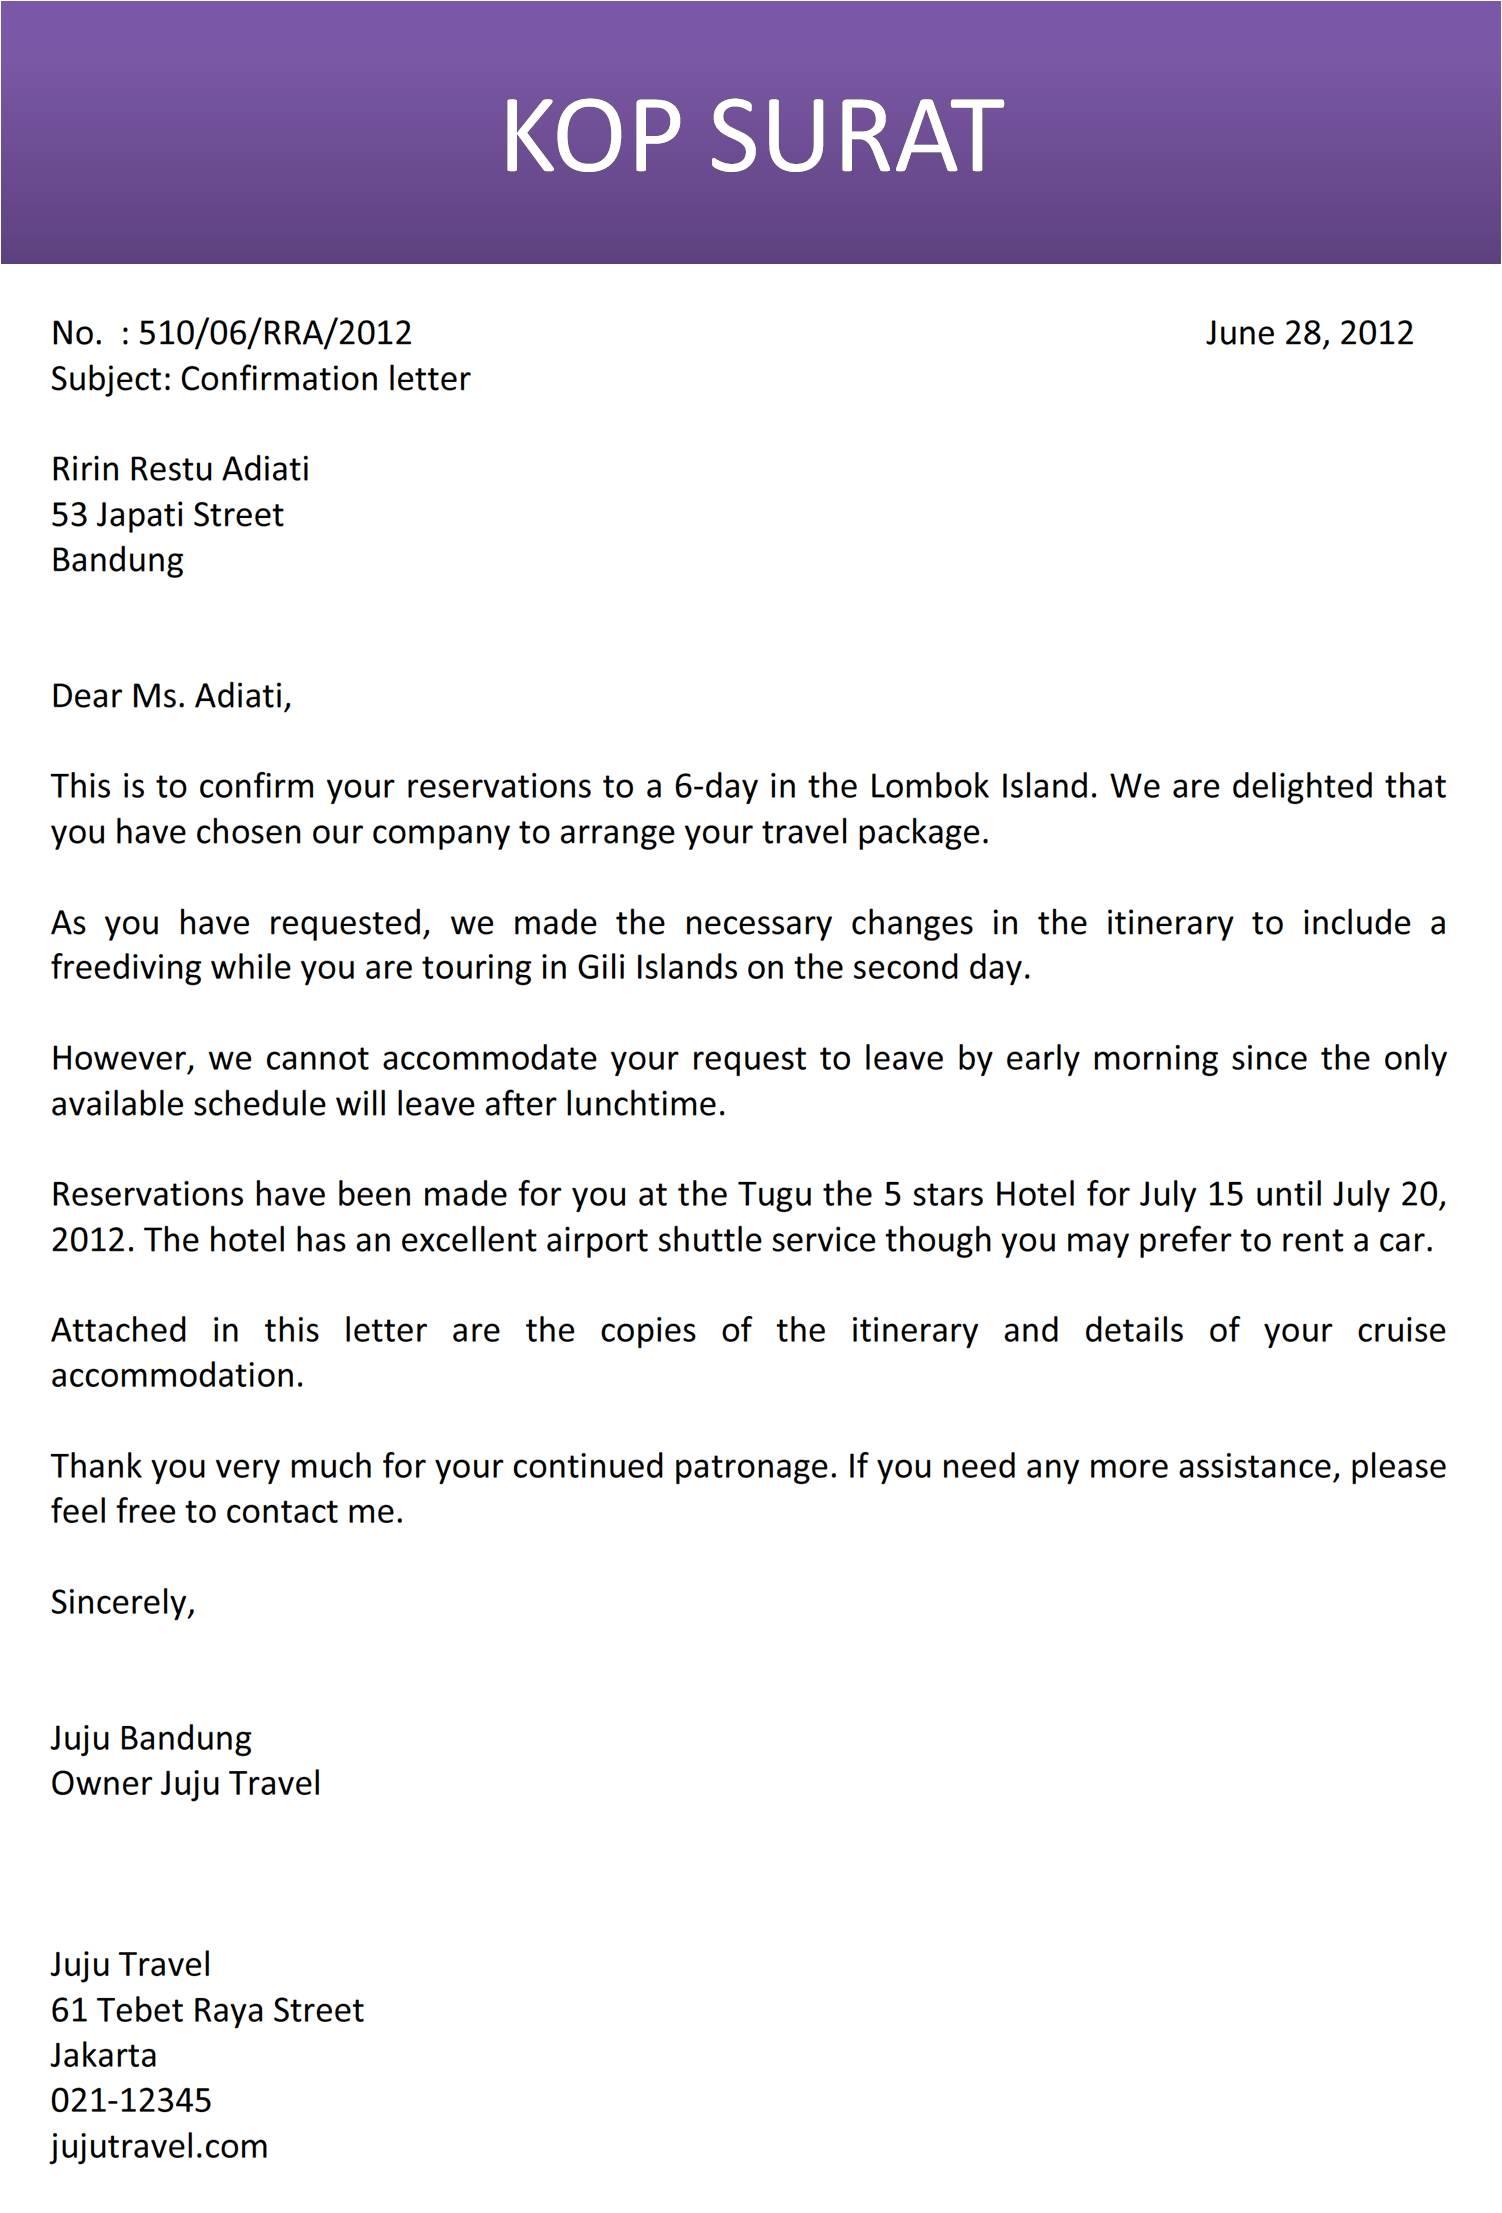 19 Contoh Surat Bahasa Inggris Hotel Reservation Kumpulan Contoh Surat